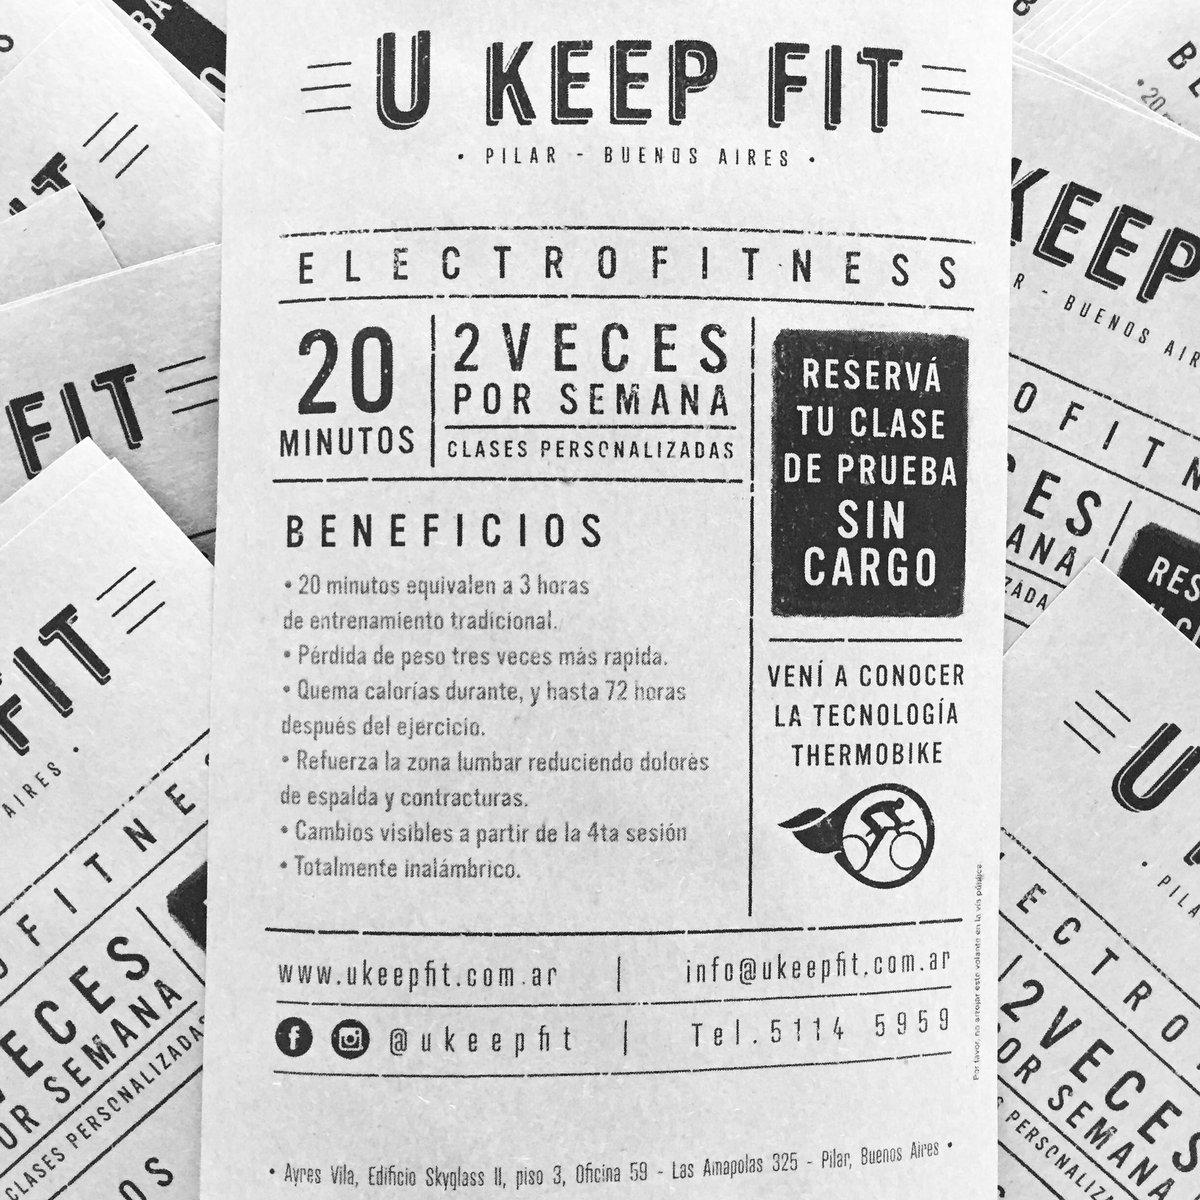 Electrofitness perdida de peso